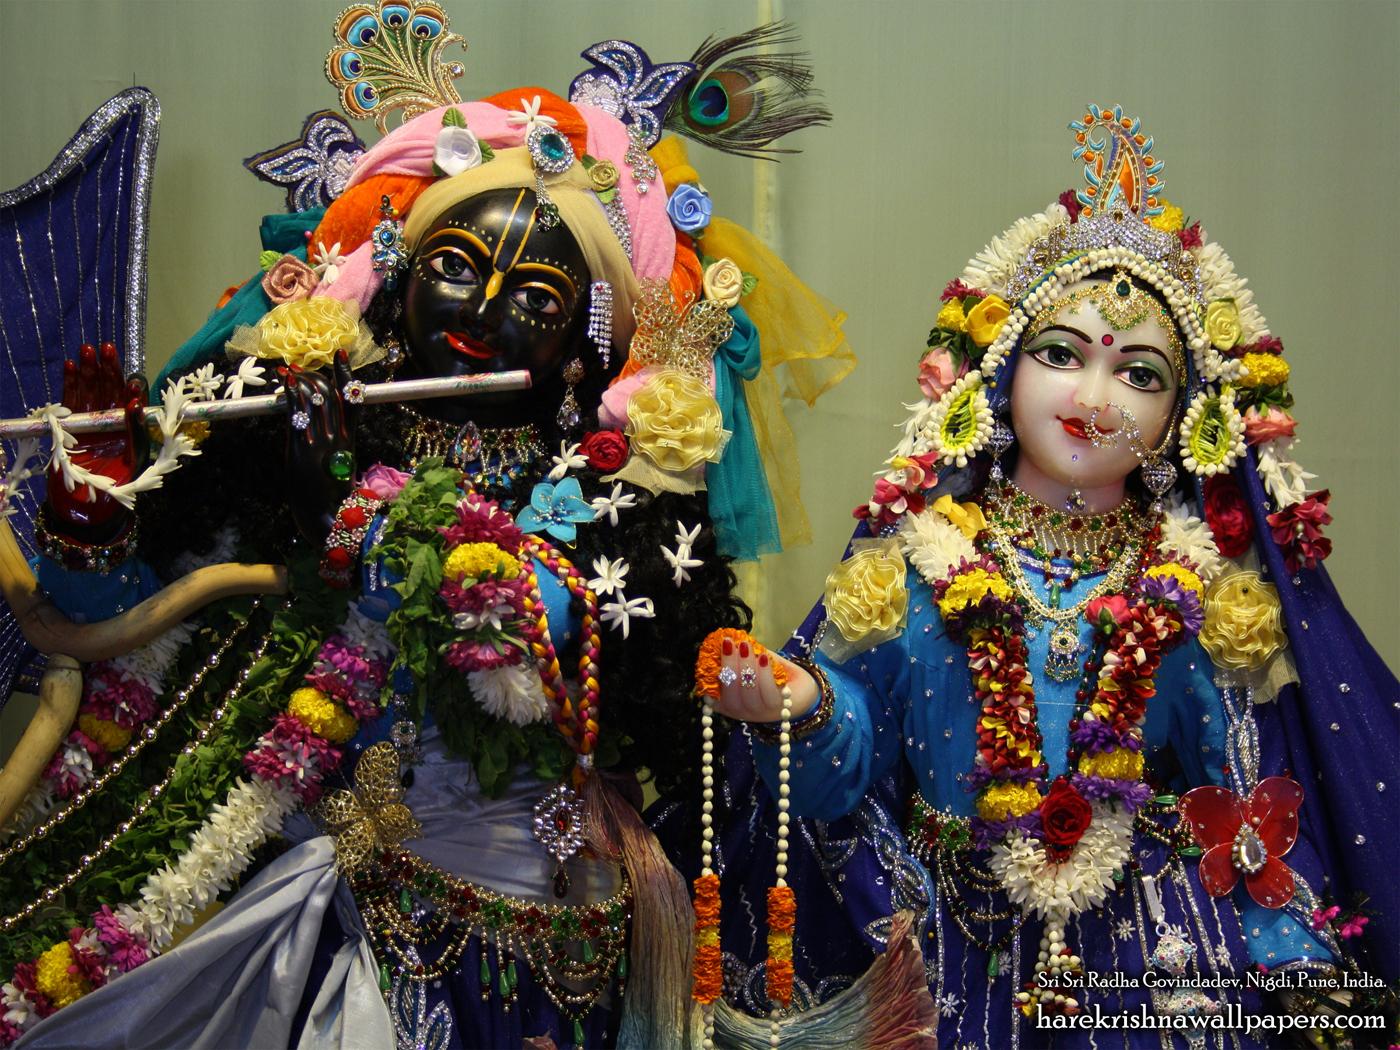 Sri Sri Radha Govind Close up Wallpaper (009) Size 1400x1050 Download